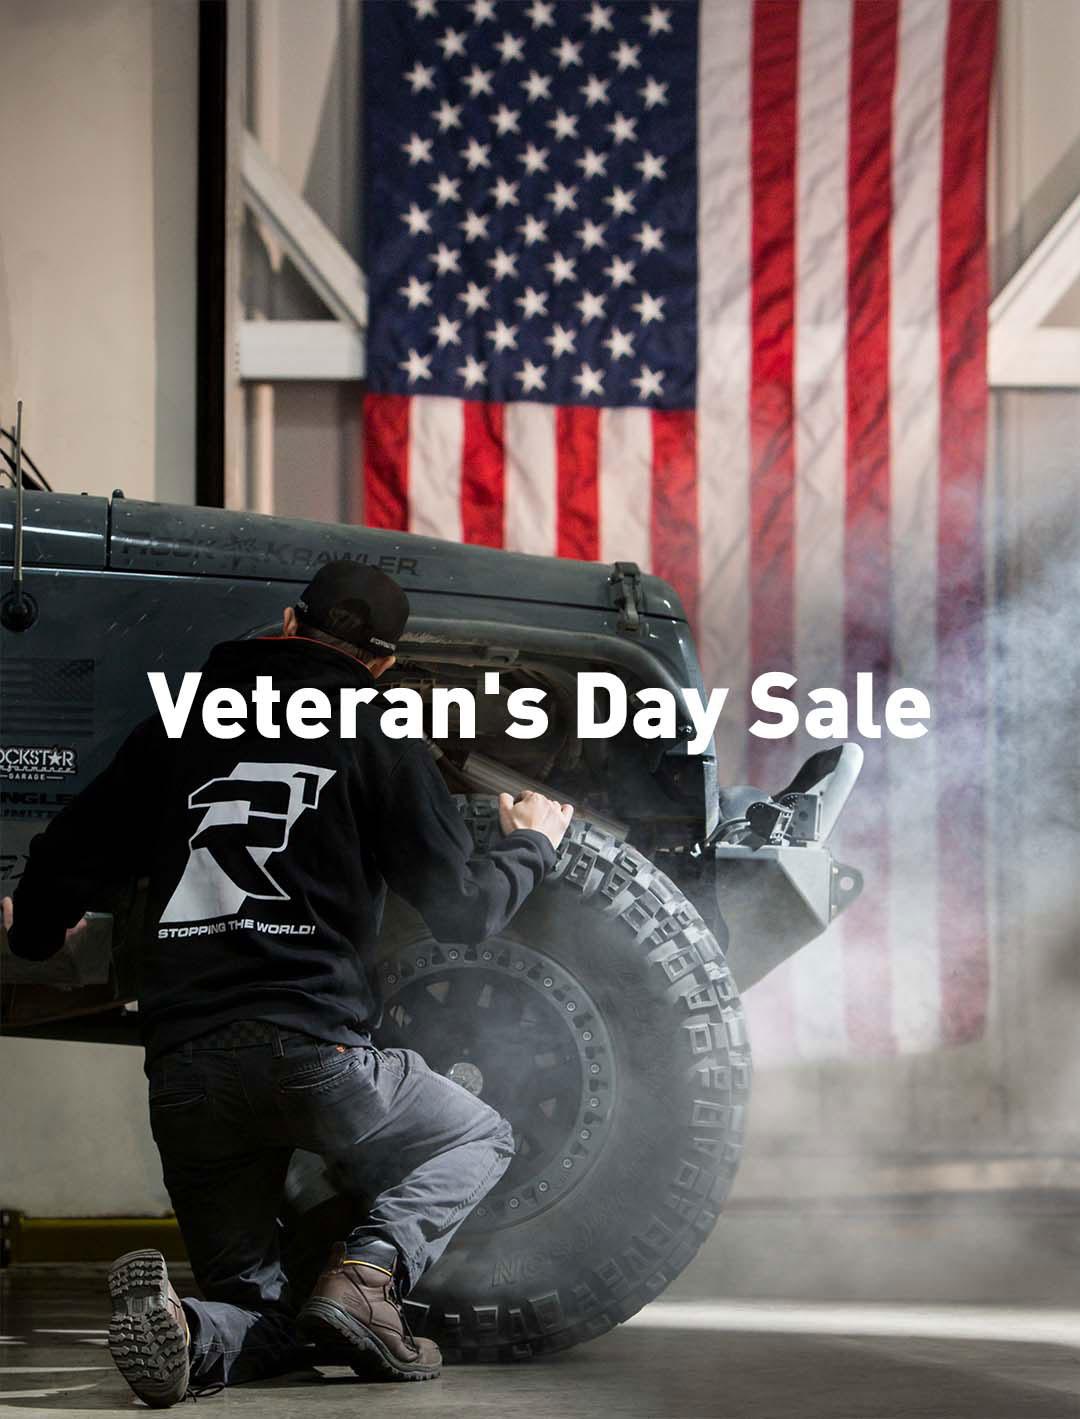 Veterans Day - Veterans Day Sale